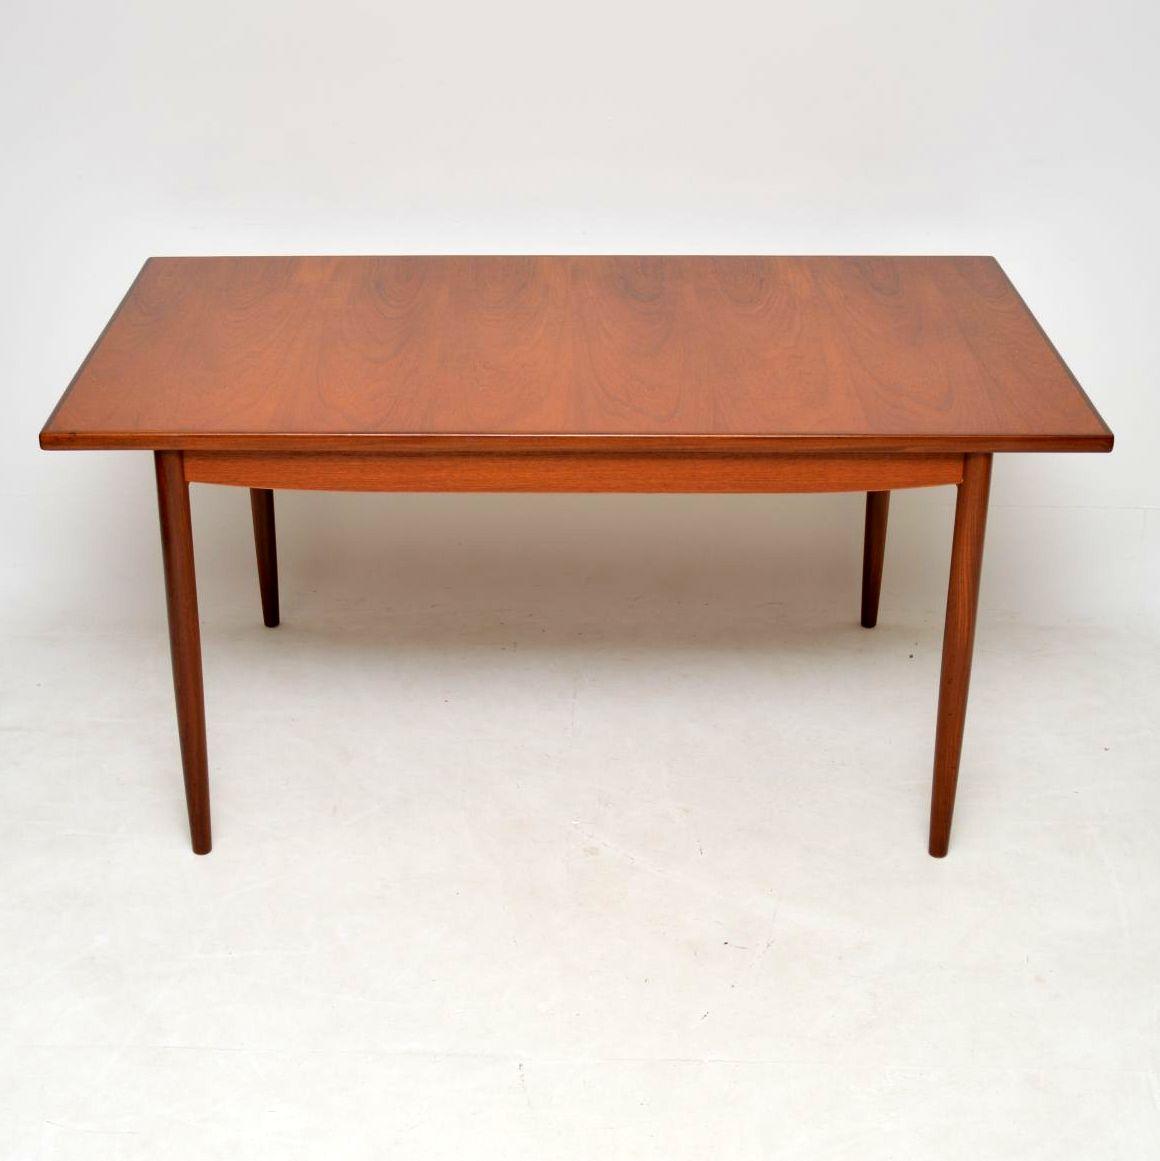 danish_teak_retro_vintage_dining_table_kofod_larsen_2